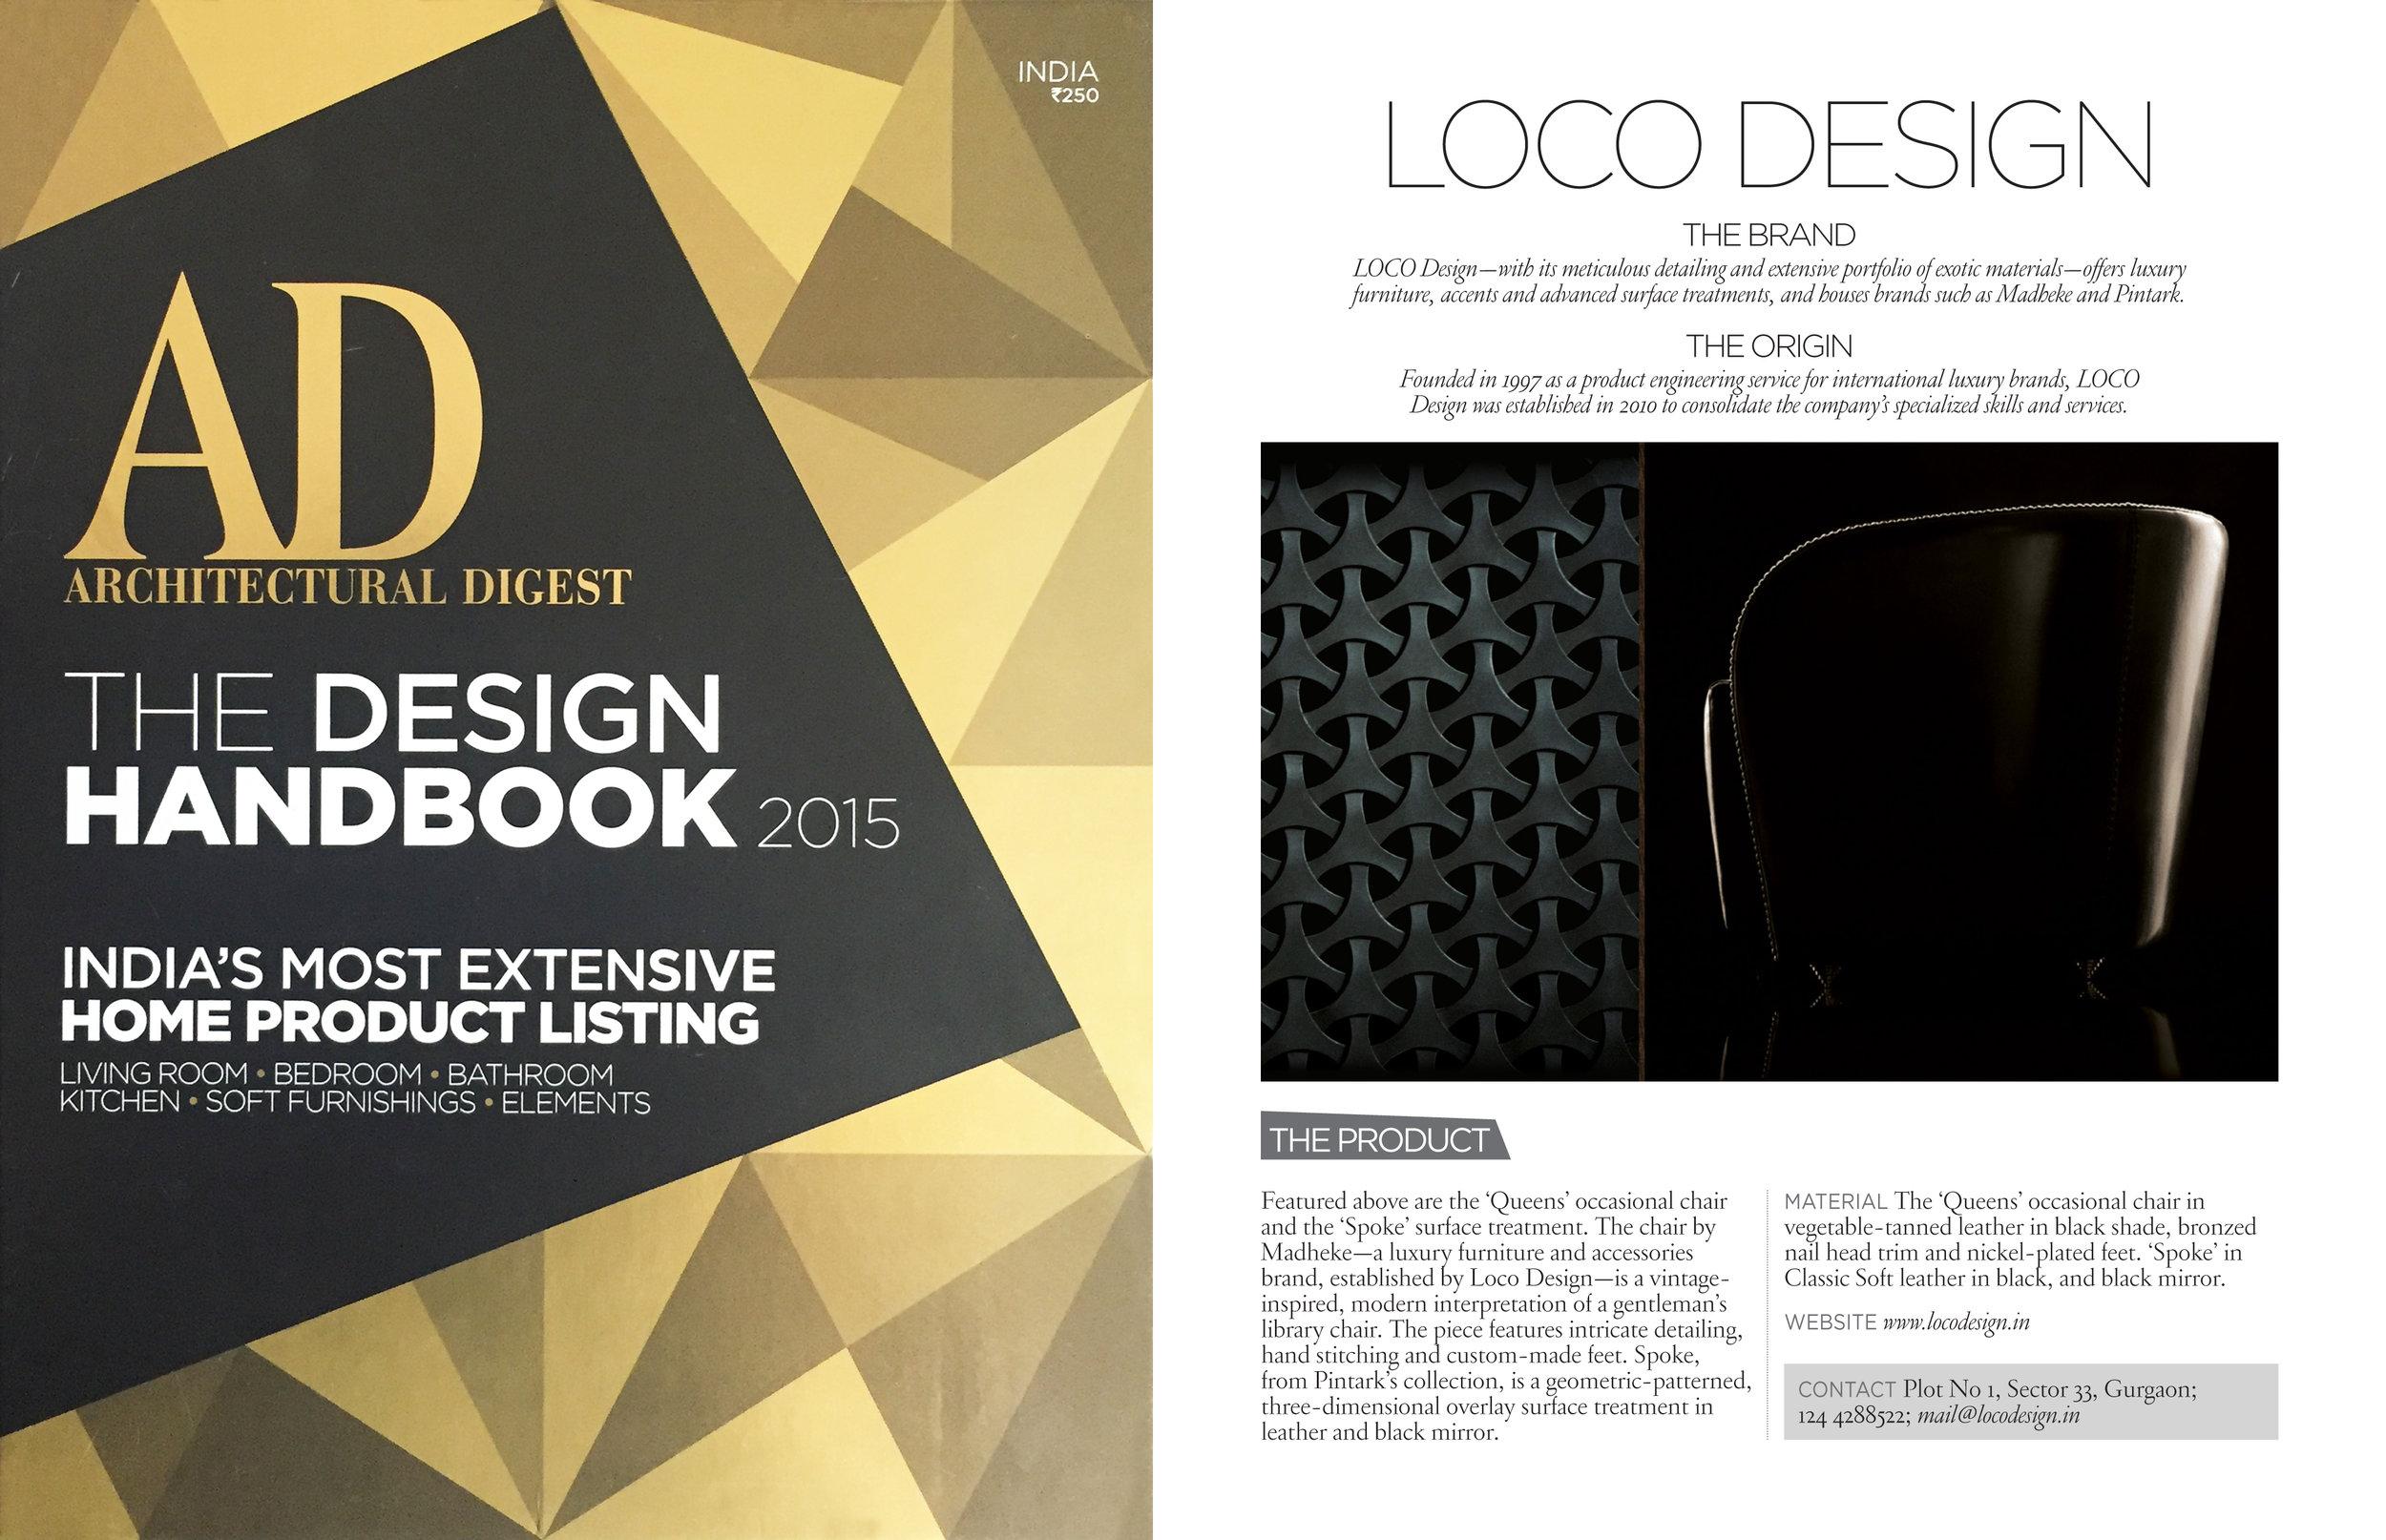 2015 The Design Handbook.jpg